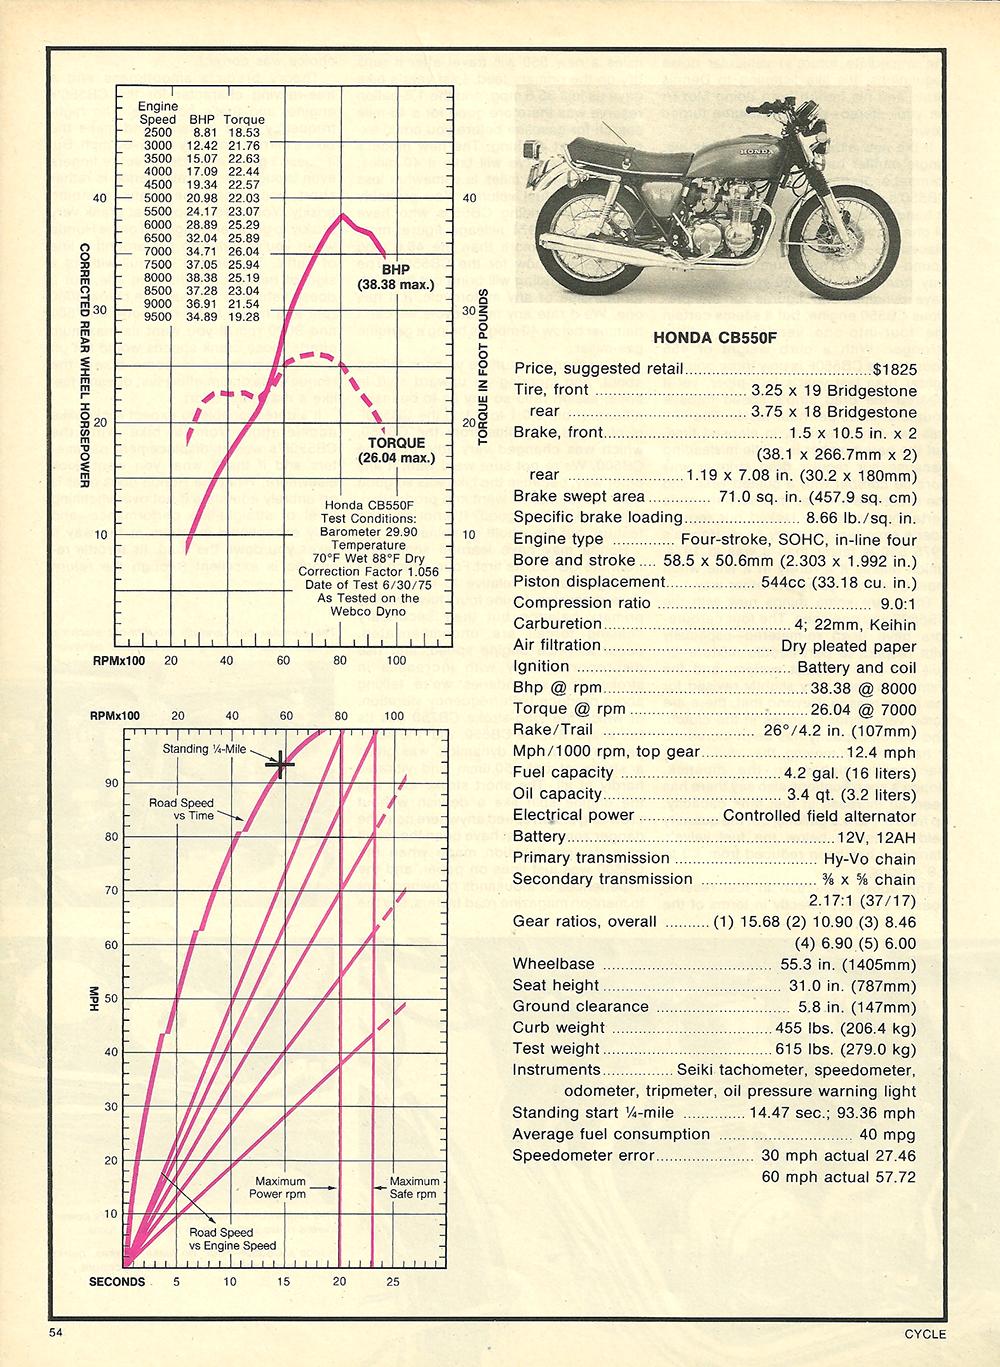 1975 Honda CB550F SS road test 4.jpg